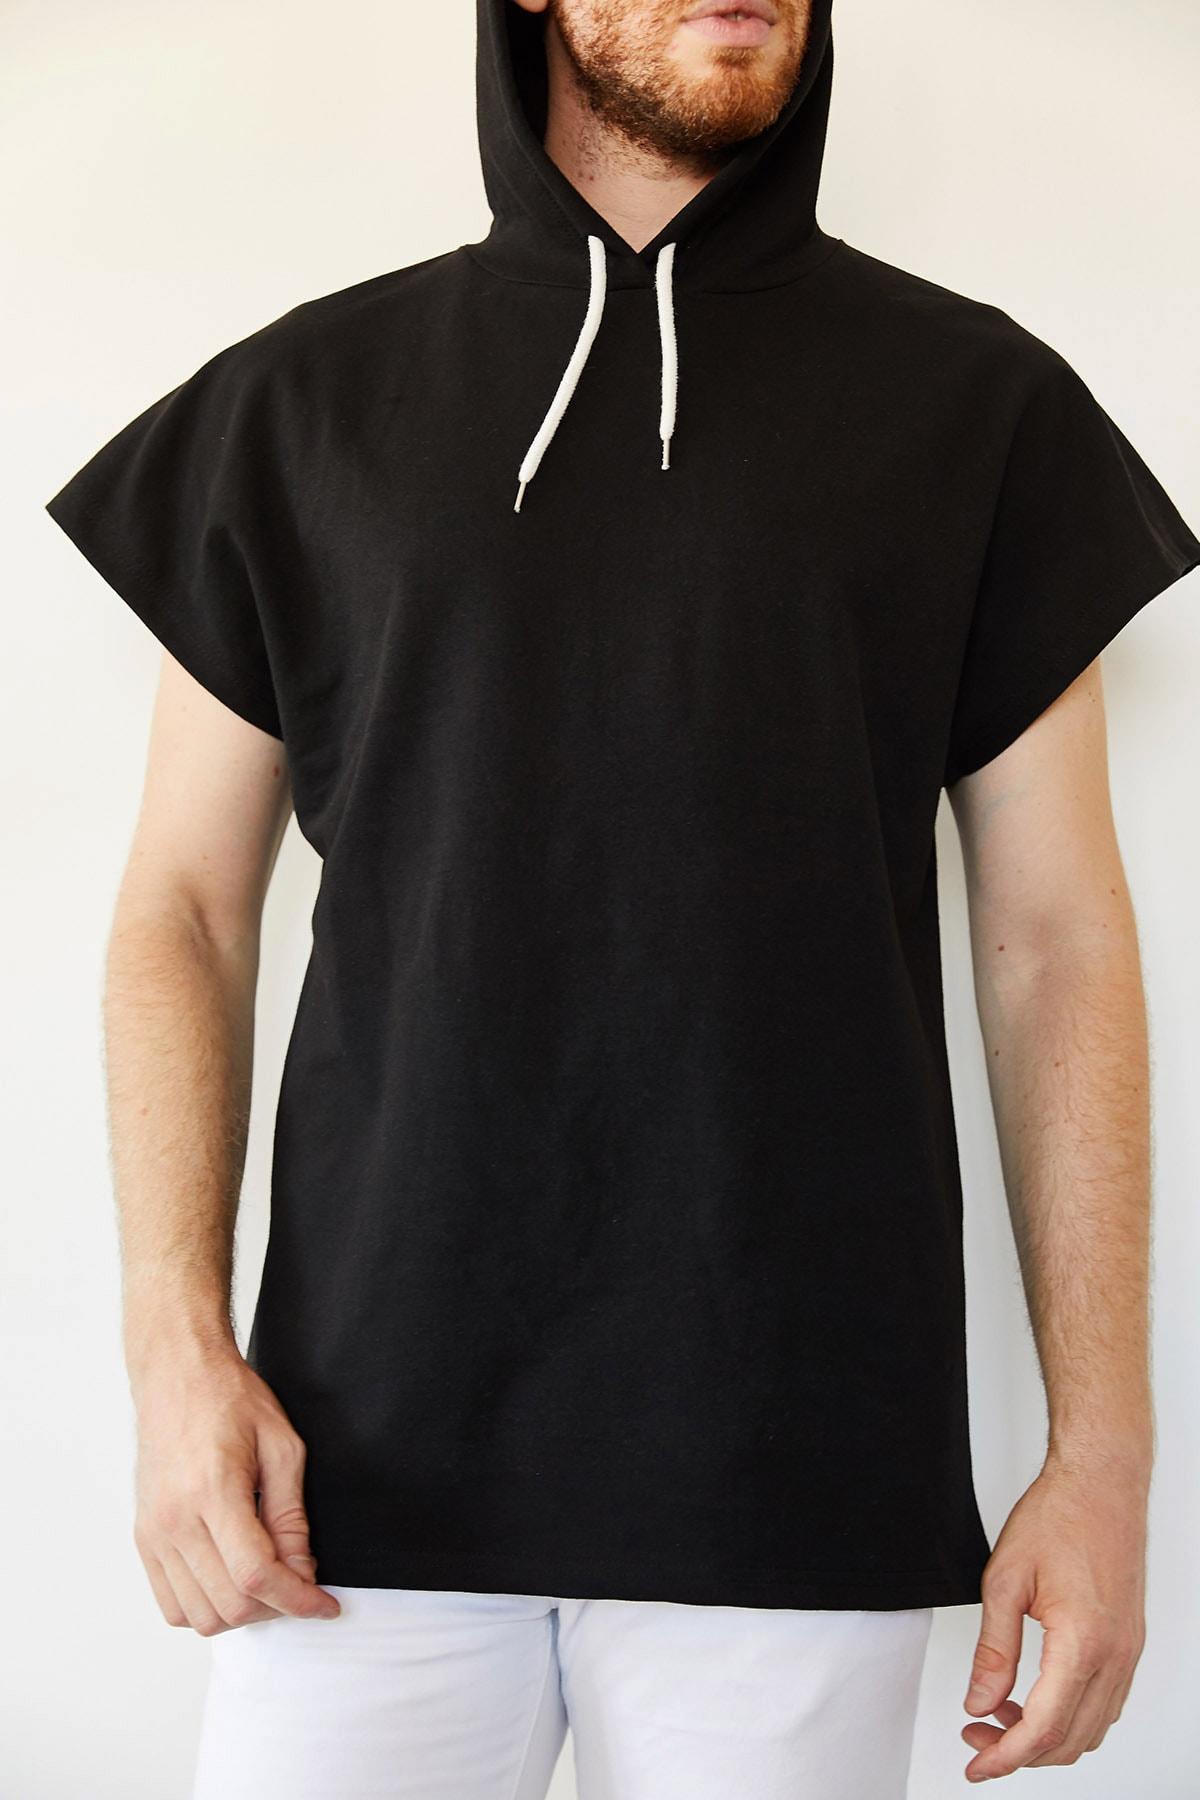 XHAN Erkek Siyah Kolsuz Sweatshirt 0yxe8-44068-02 1